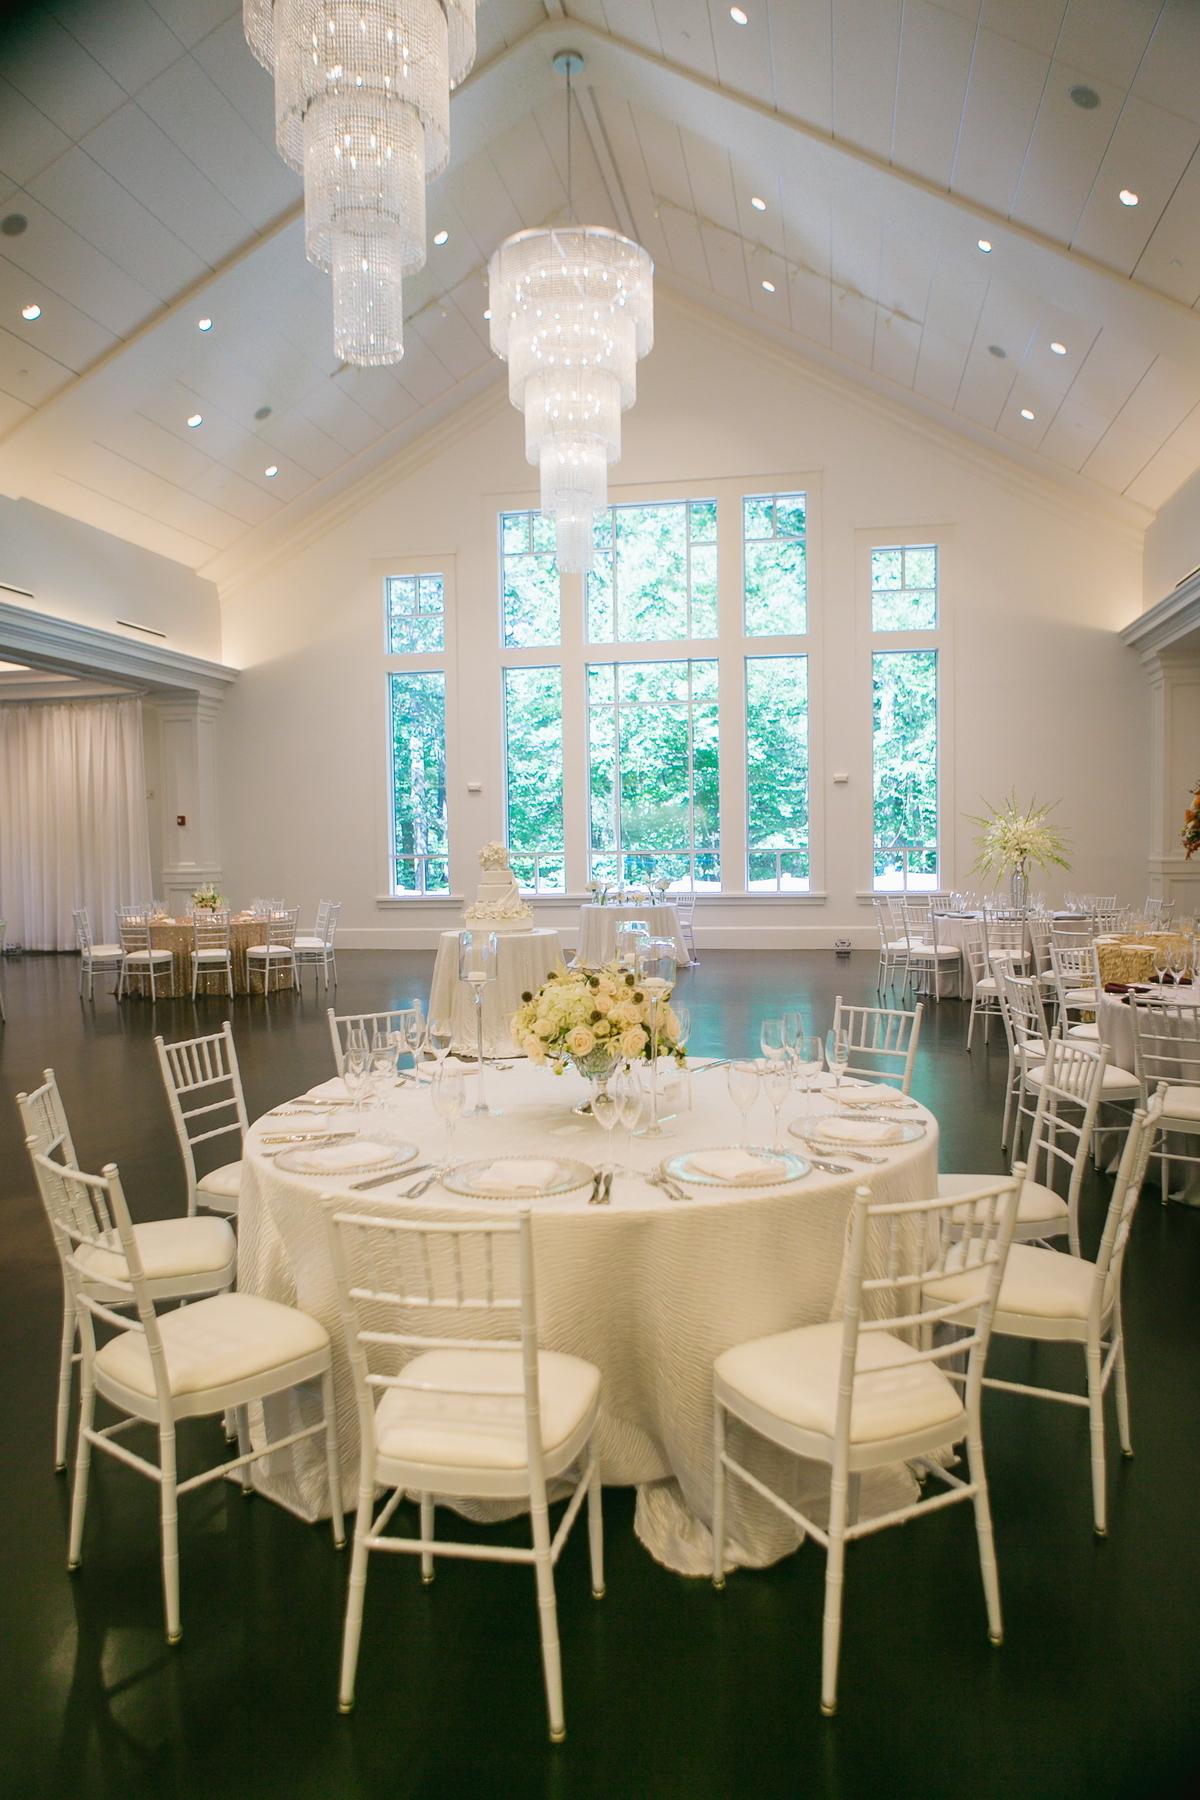 lakeview pavilion reopens as a wedding venue � boston magazine